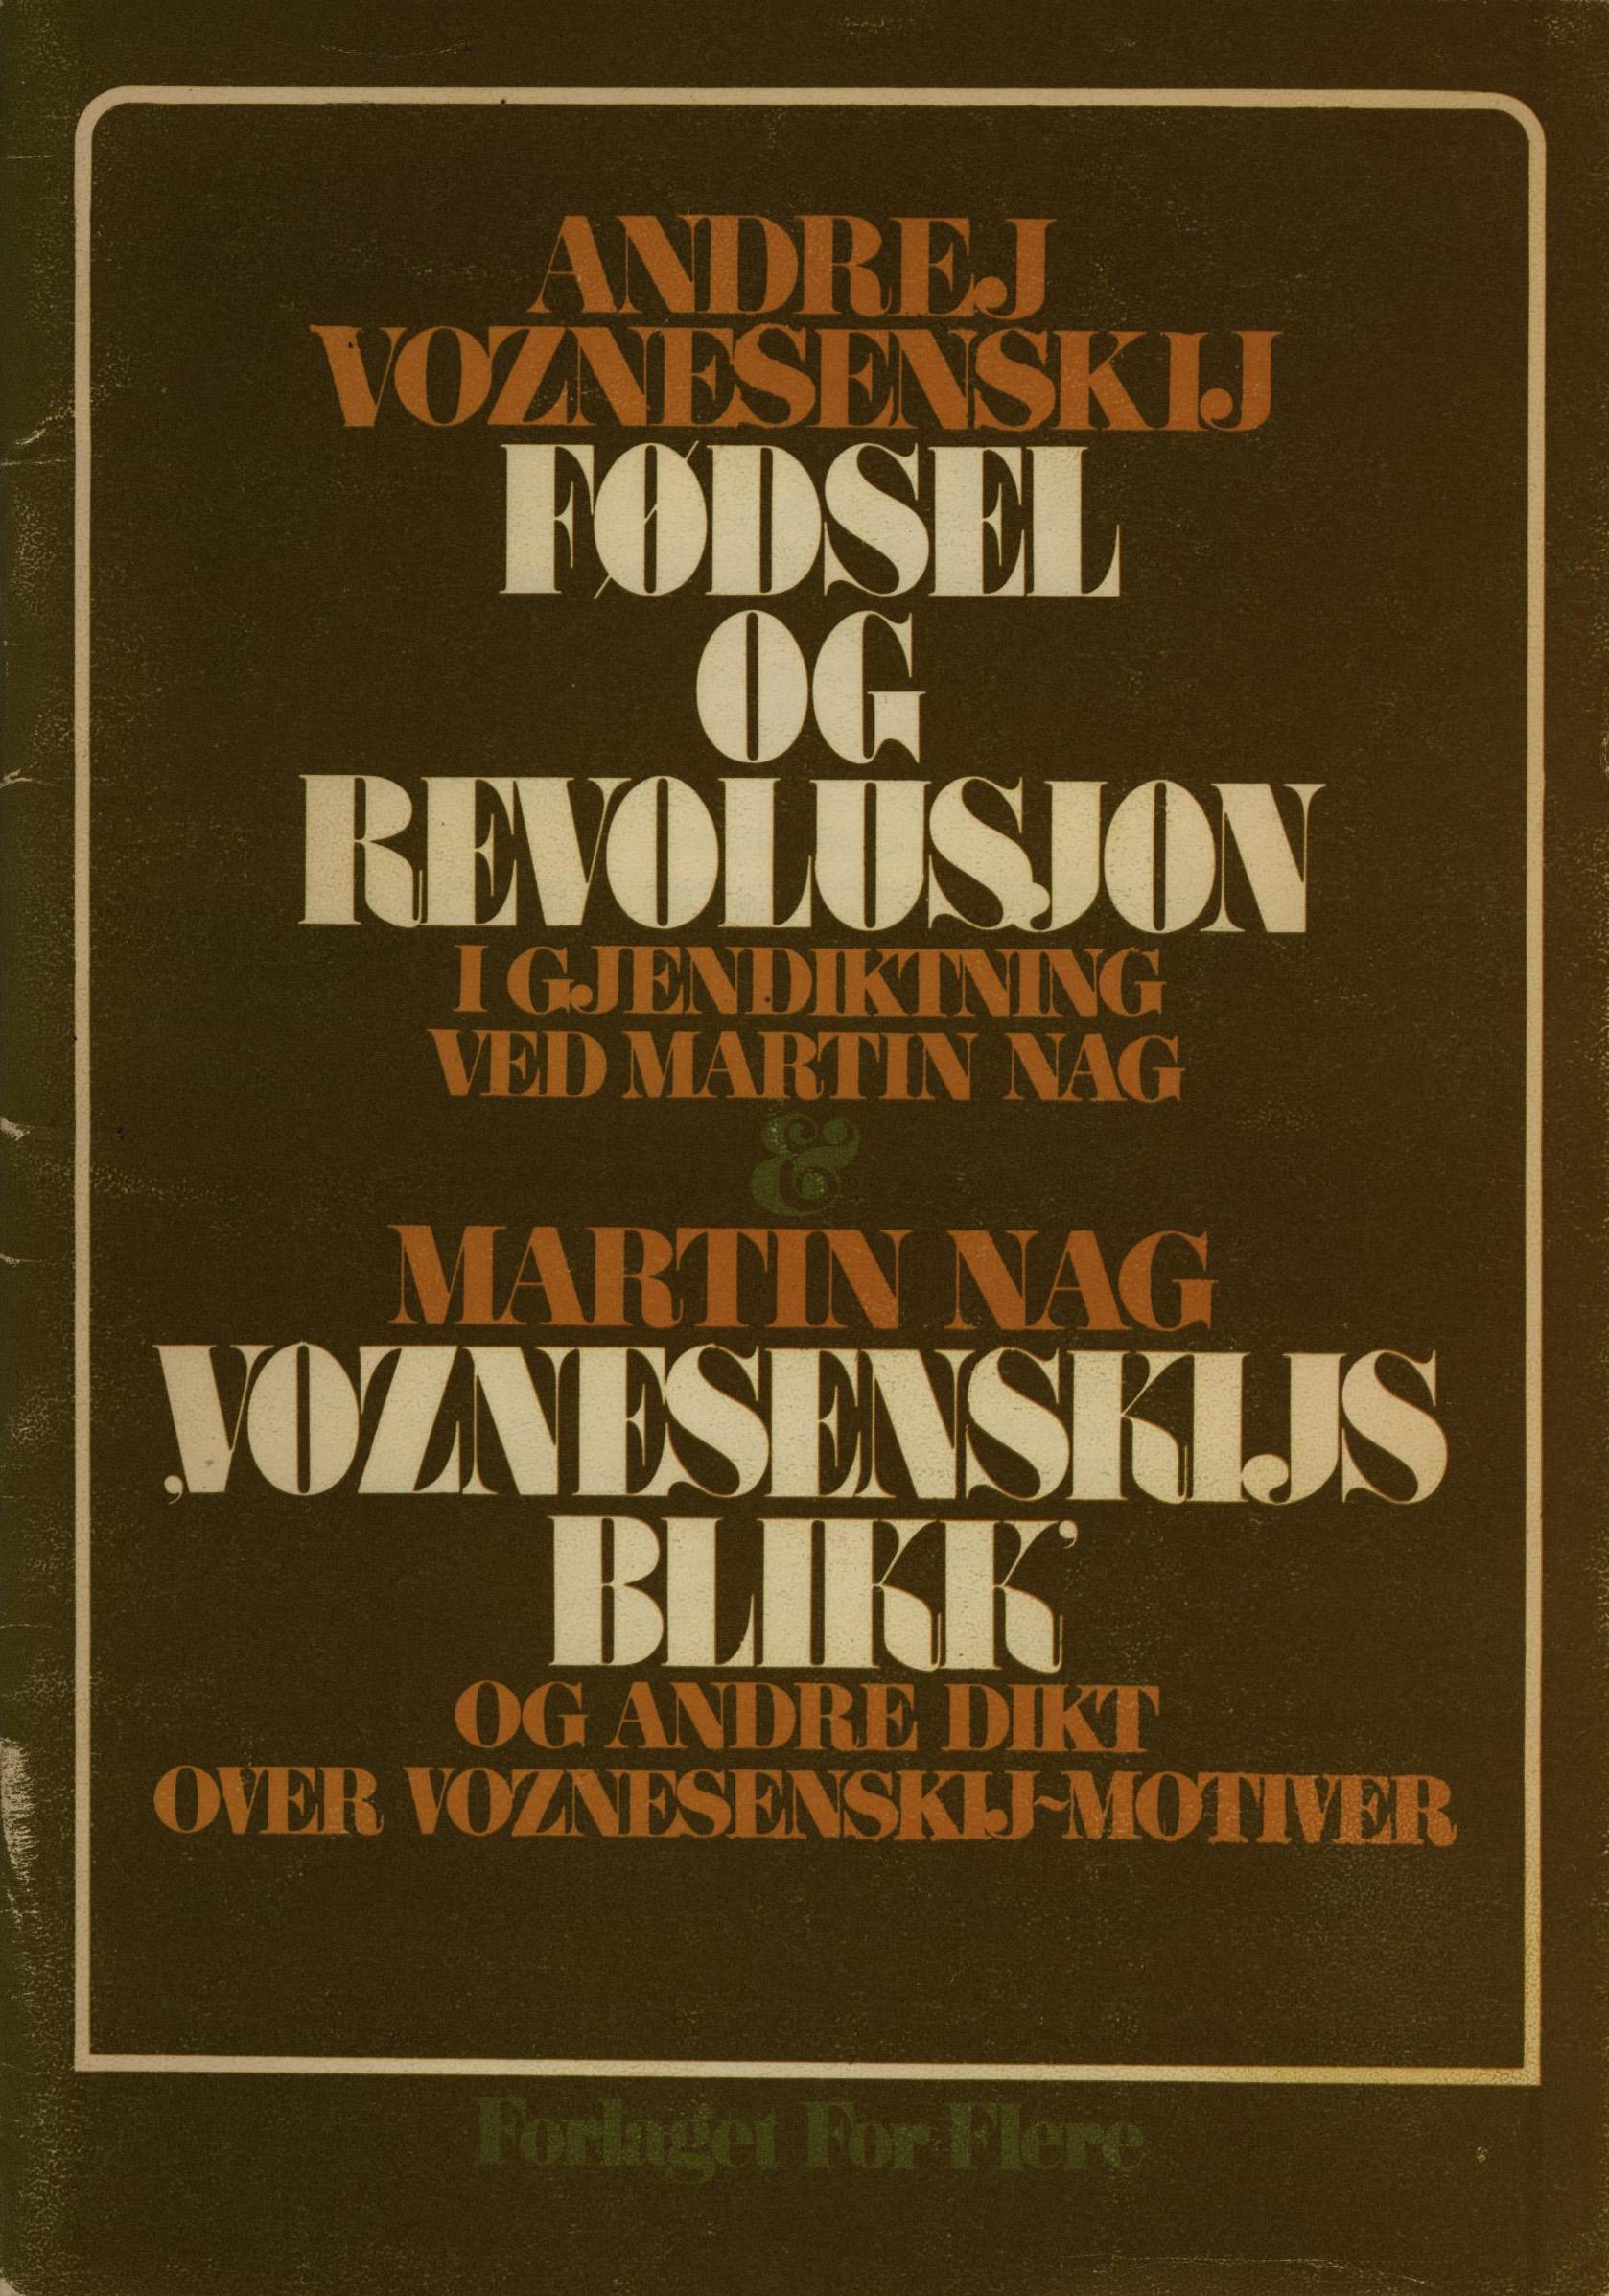 Martin Nag, Andrej Voznesenskij:  Fødsel og revolusjon - Voznesenskijs blikk